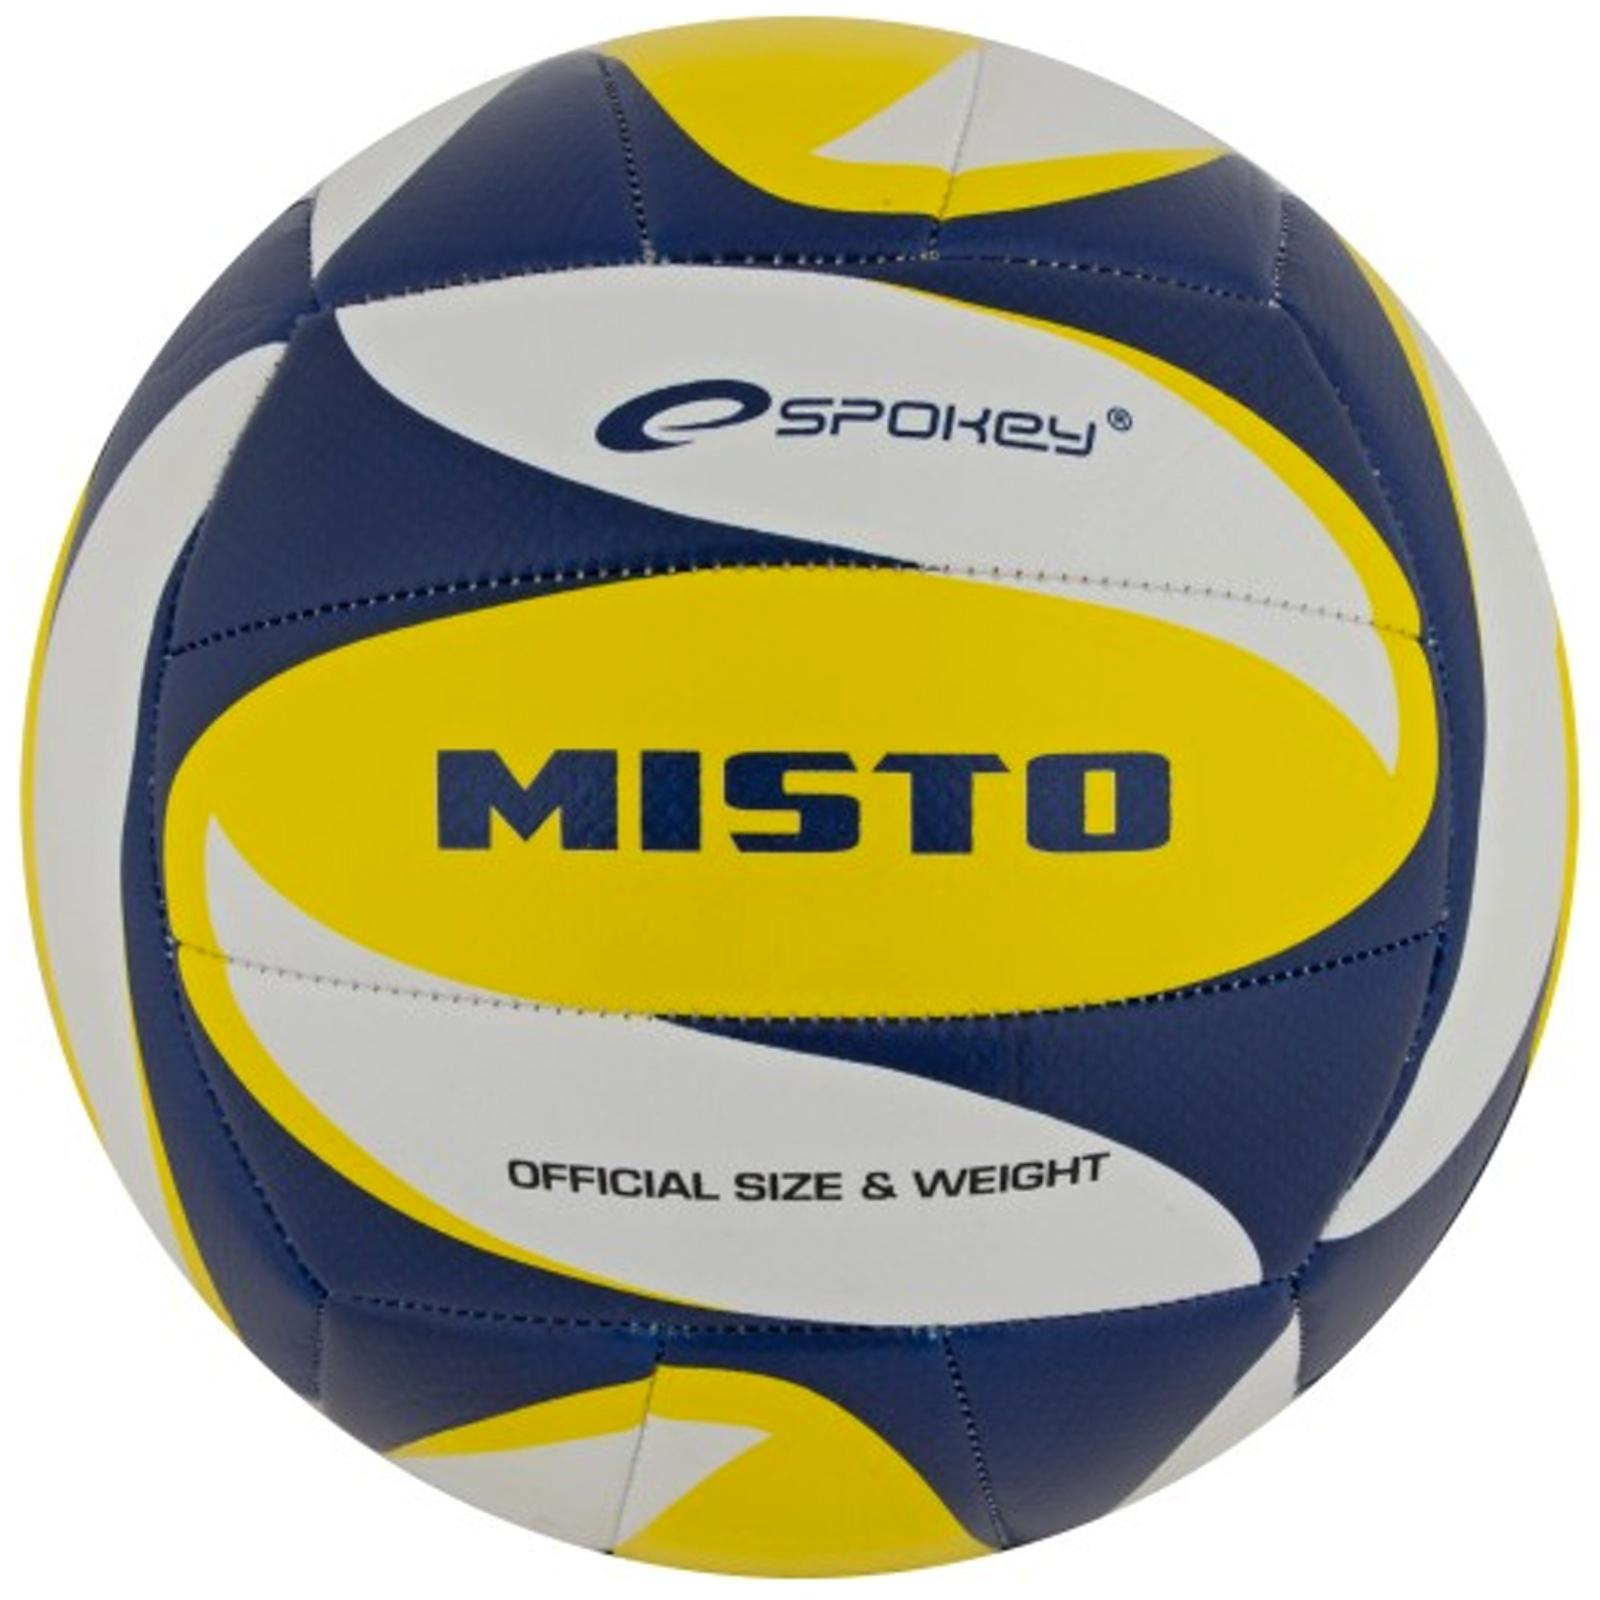 Volejbalový míč SPOKEY Místo modro-žlutý